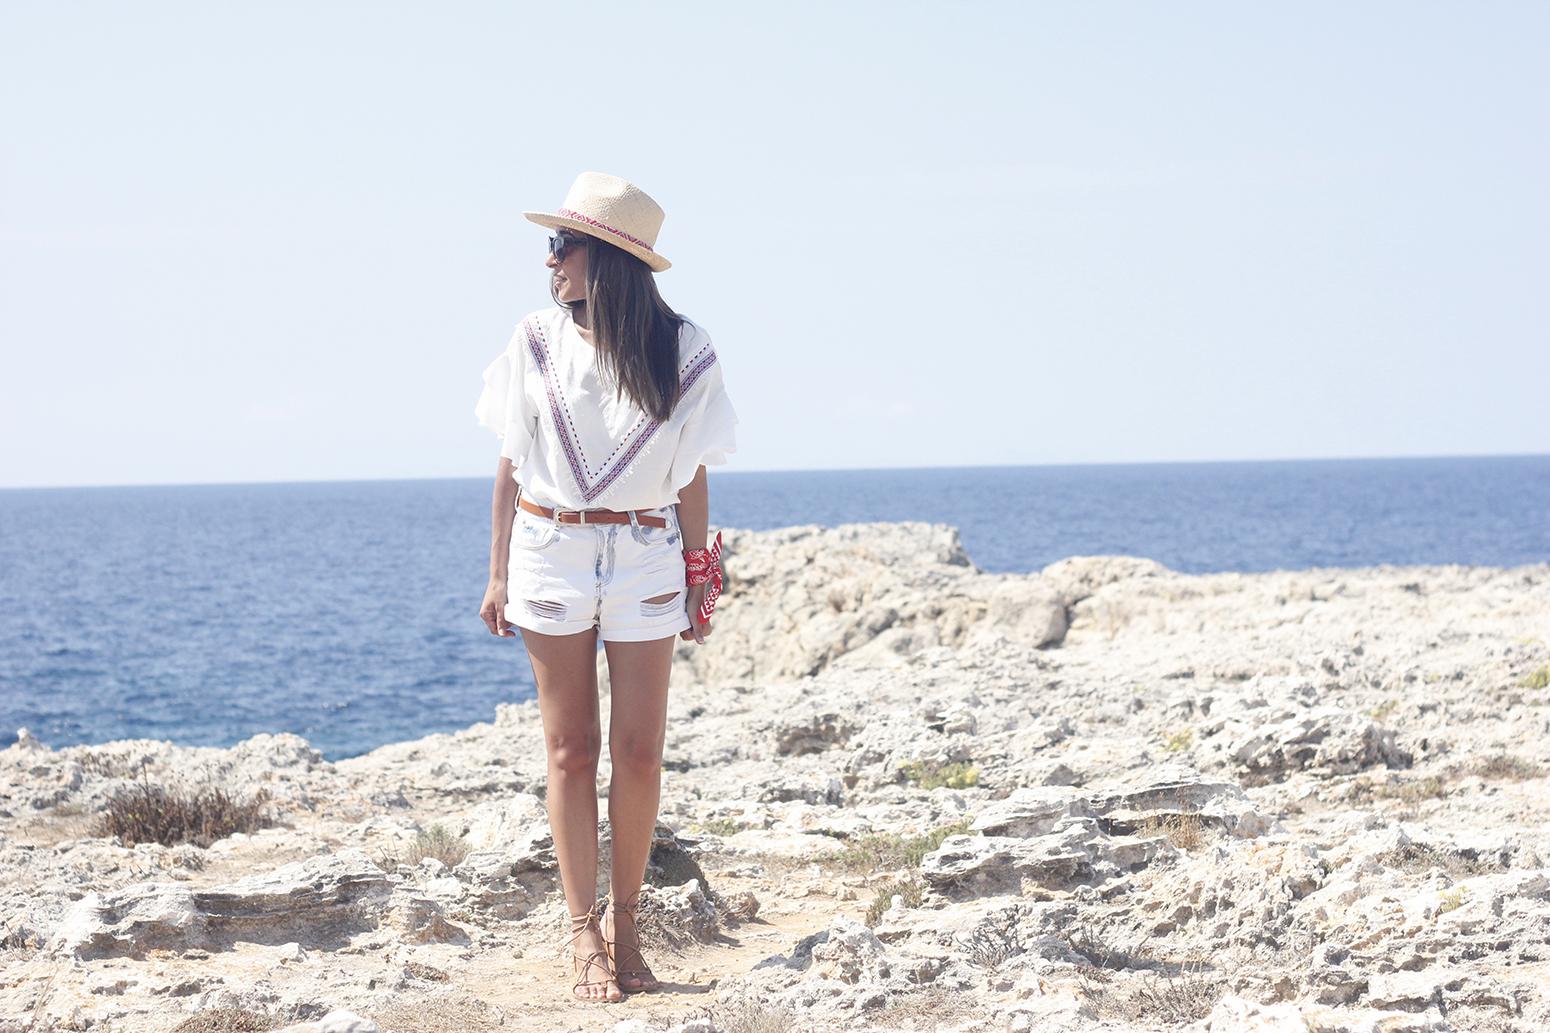 White Summer look bandana beach outfit03